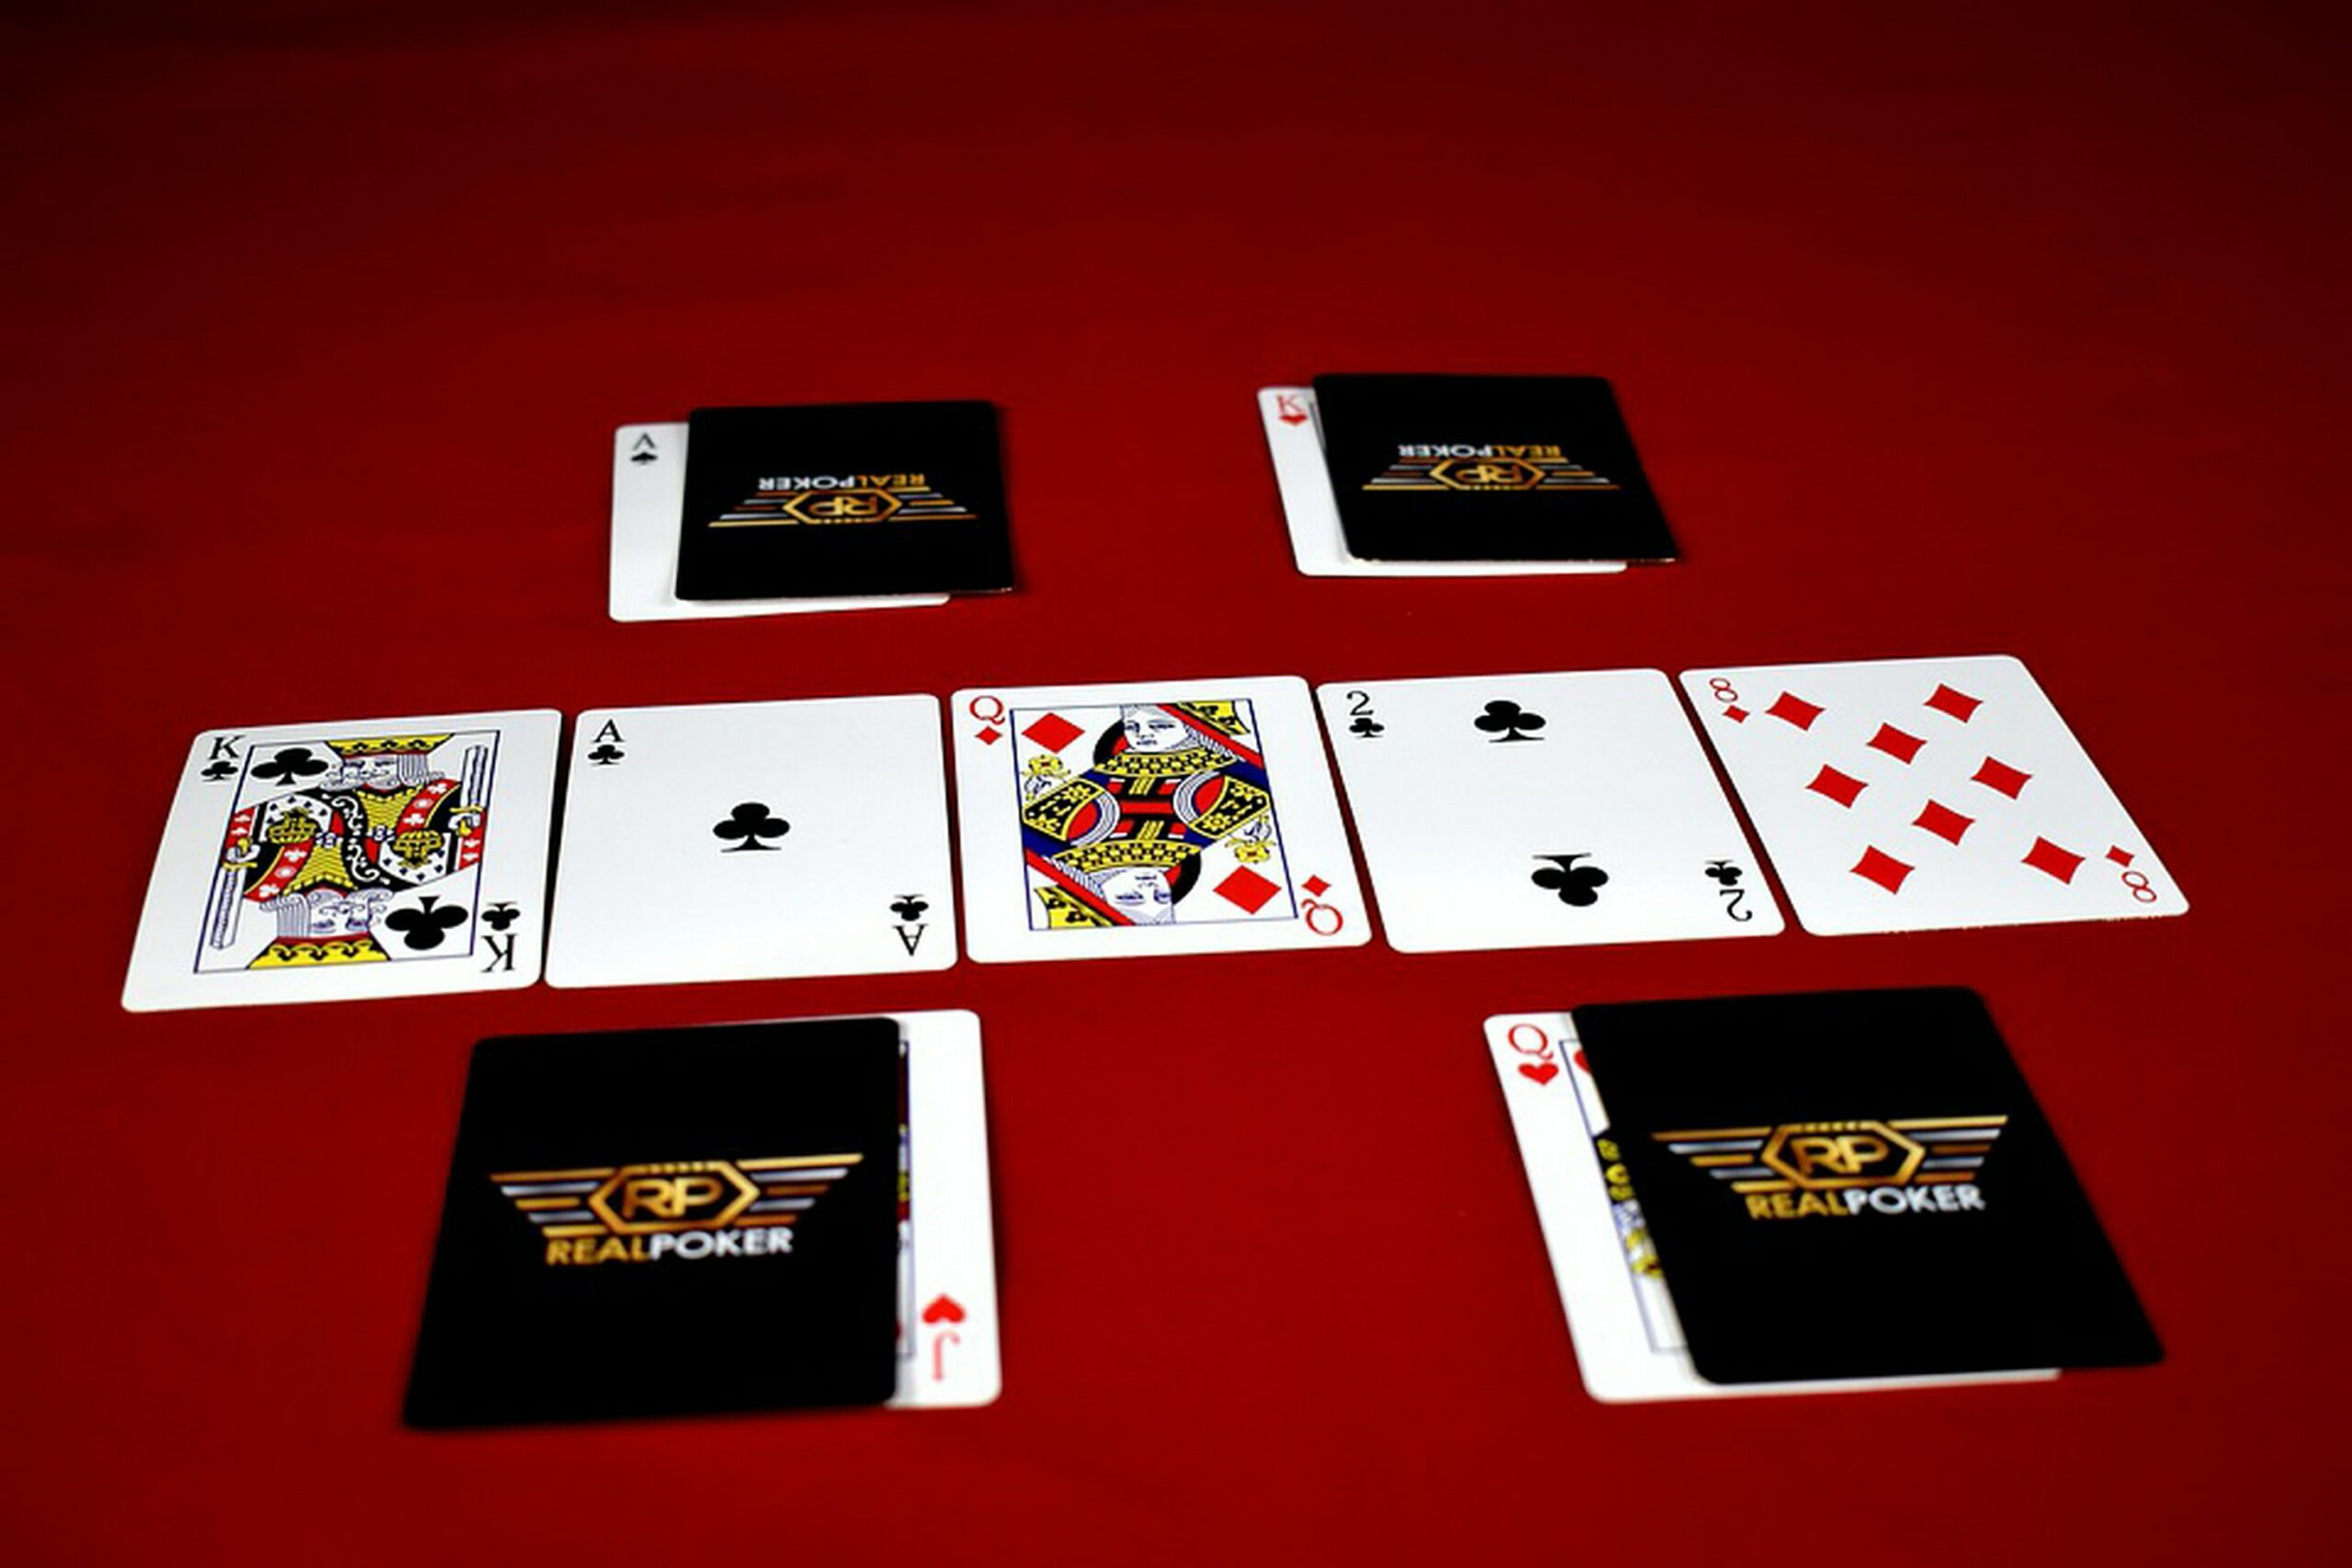 How to win zynga poker everyday